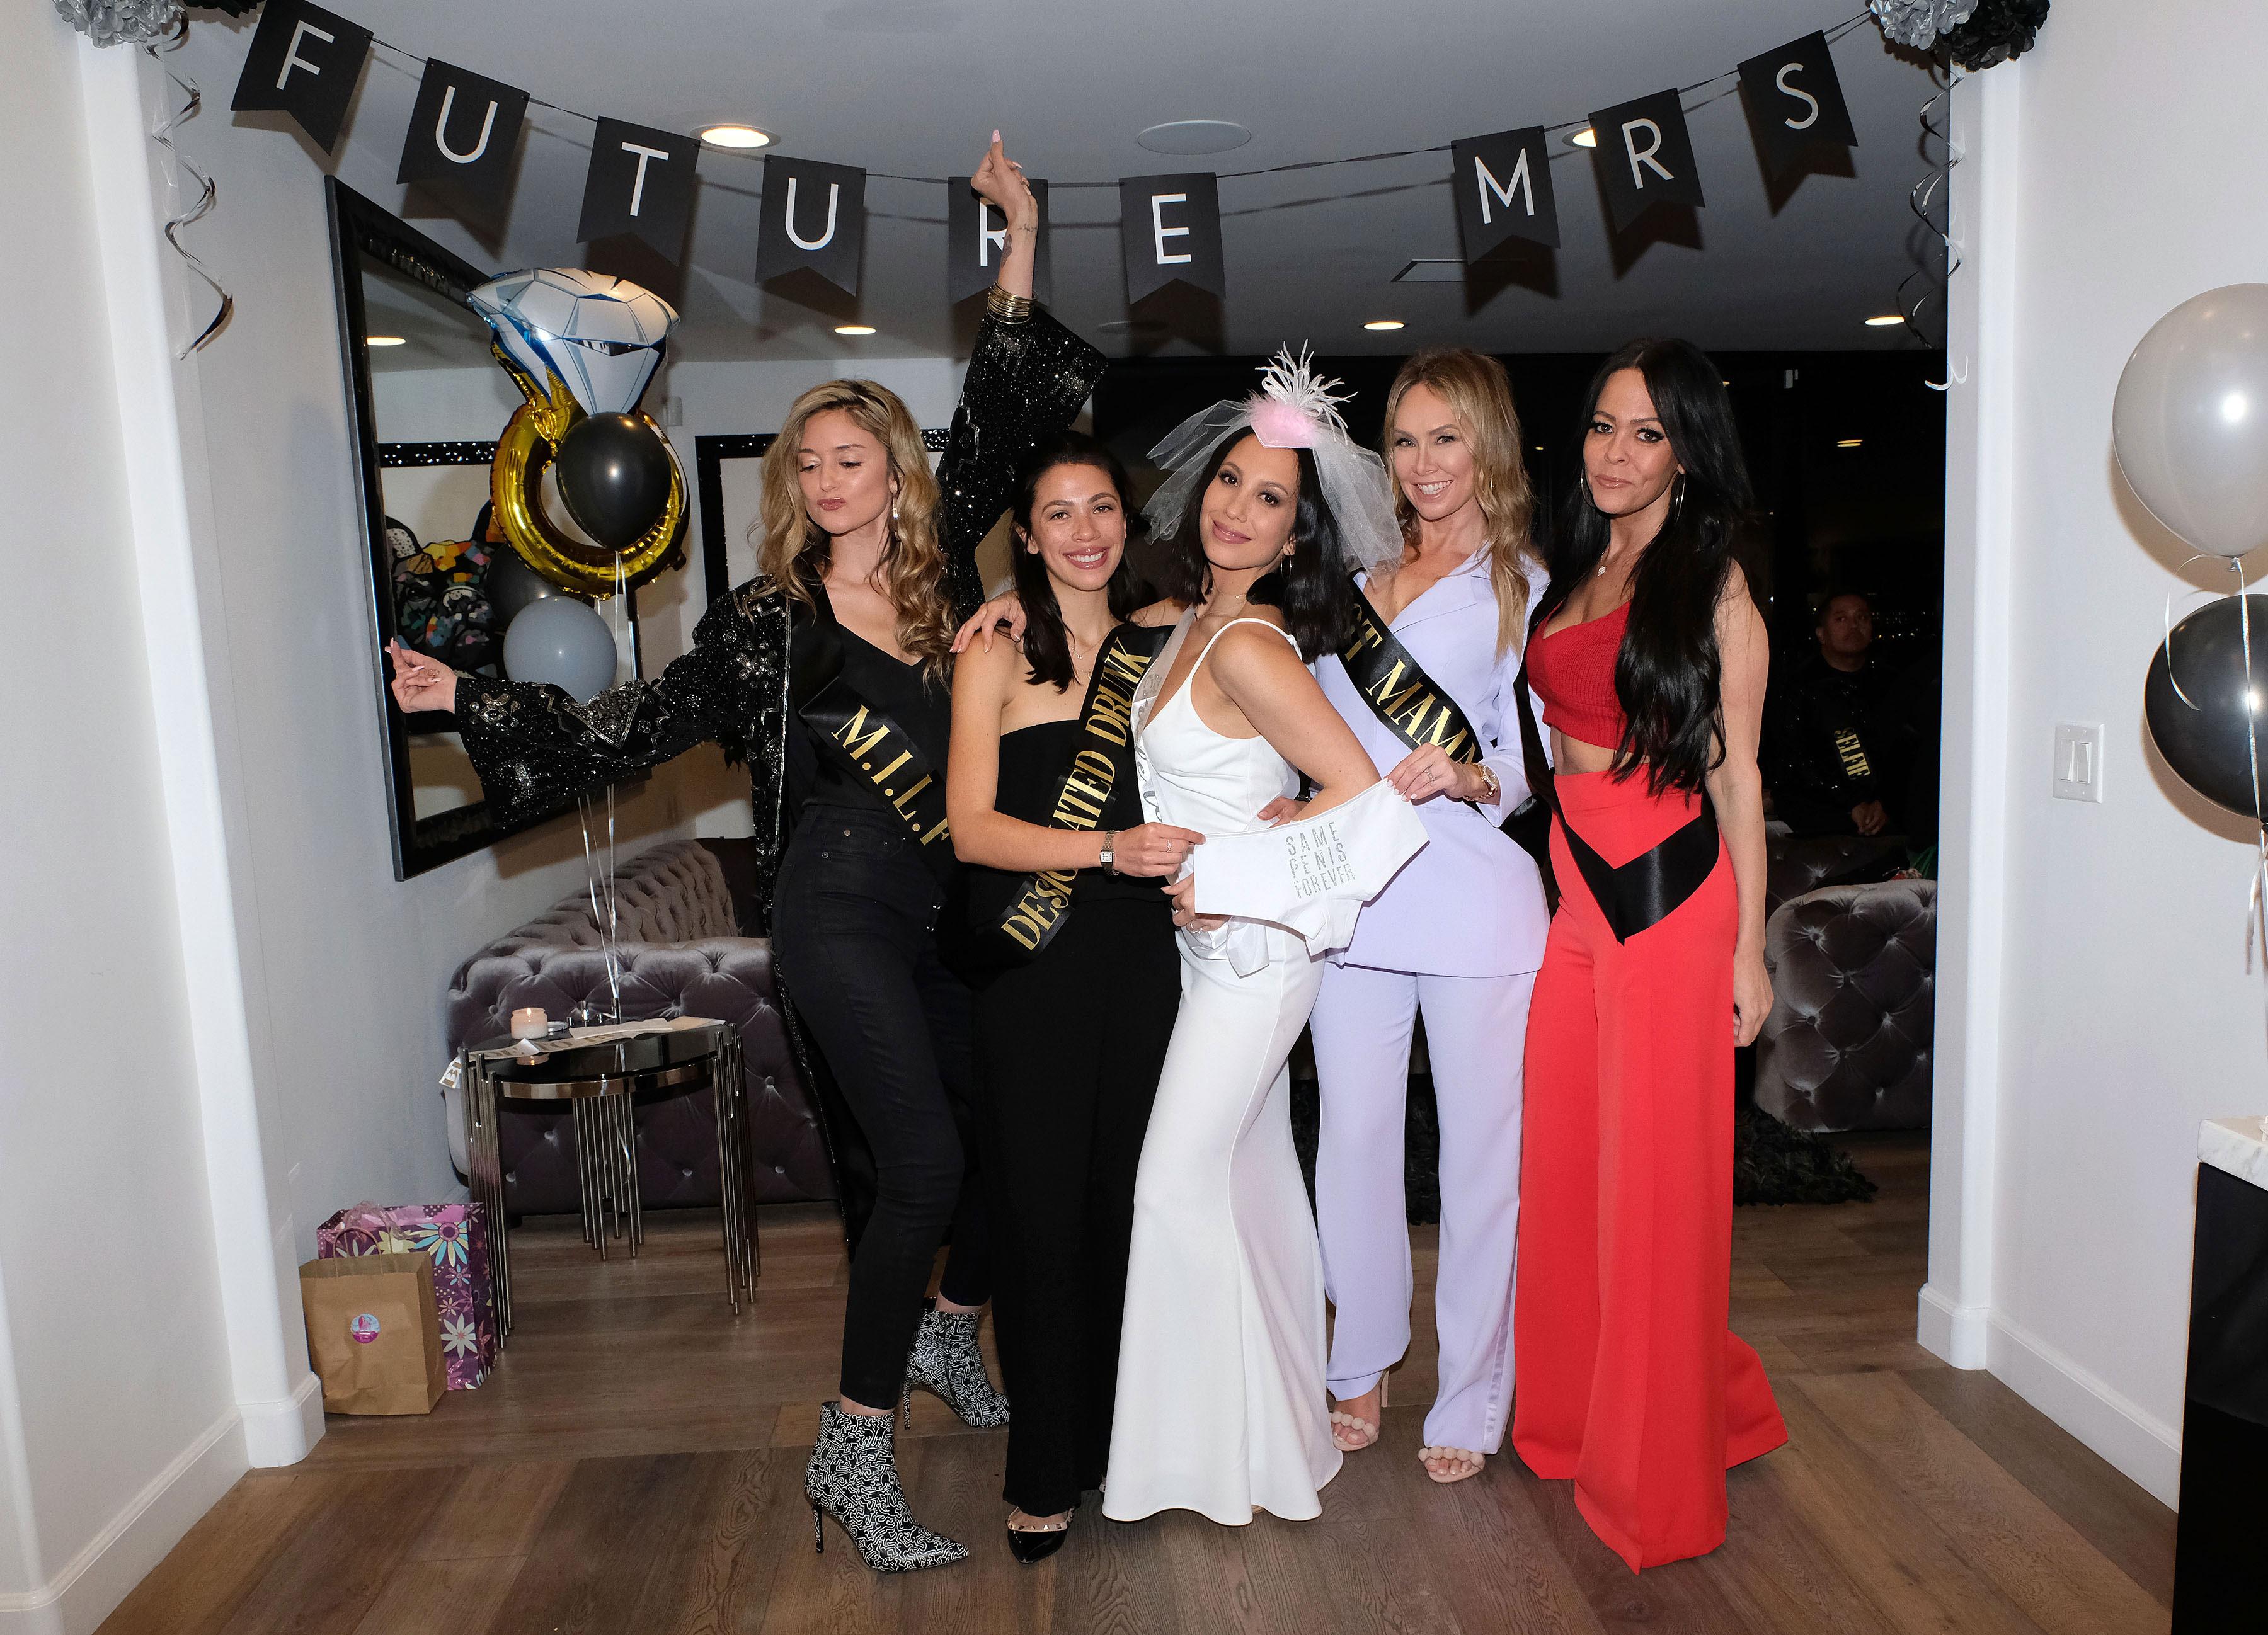 4578028db4 Cheryl Burke Celebrates Bachelorette Party With Kym Johnson: Pics